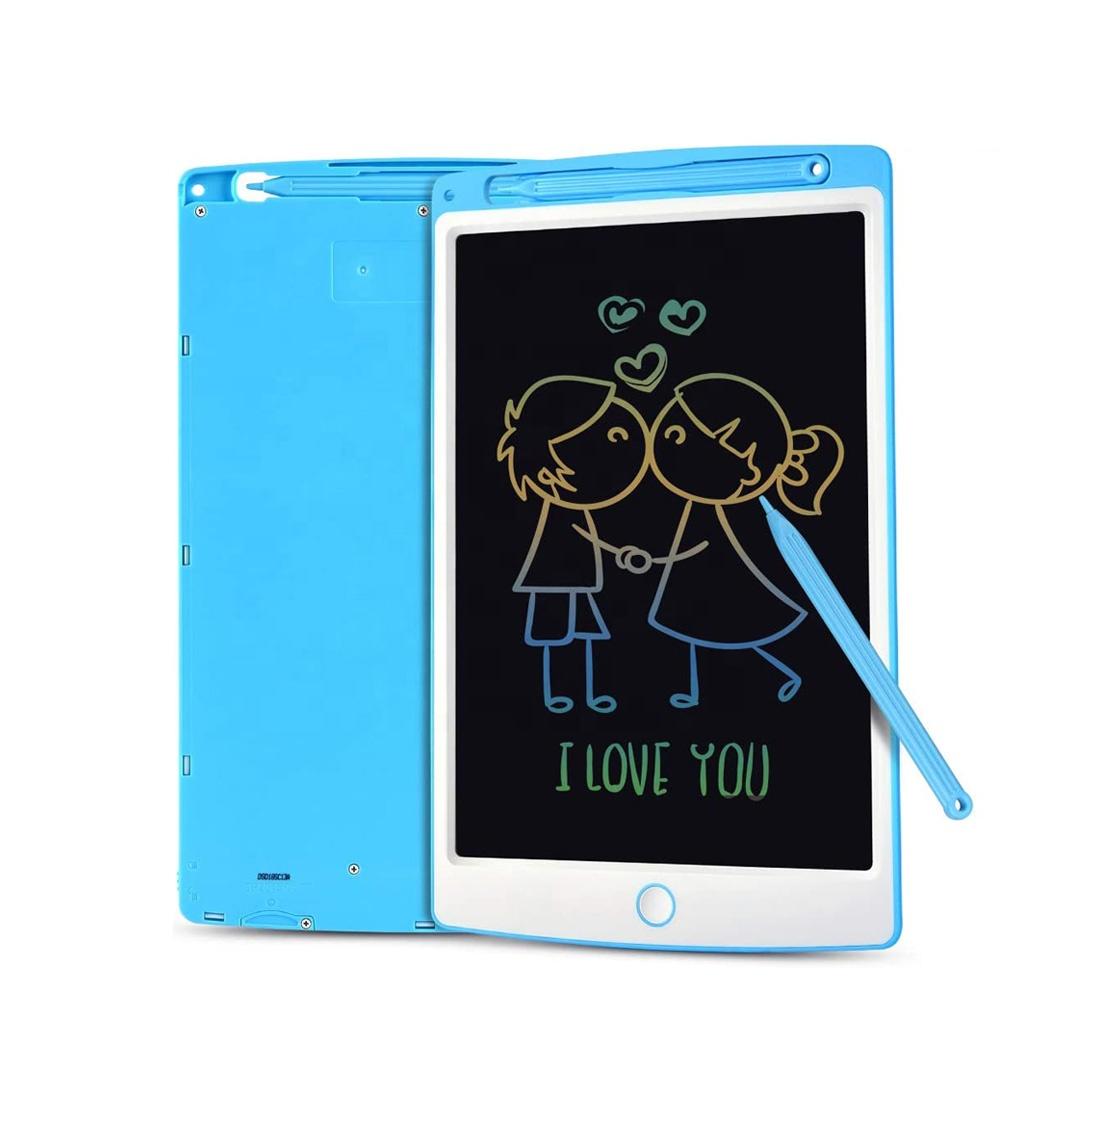 Notebook New Product Innovative Gift E-writer Memo Pad Kid Drawing Lcd Writing Board - Yola WhiteBoard | szyola.net